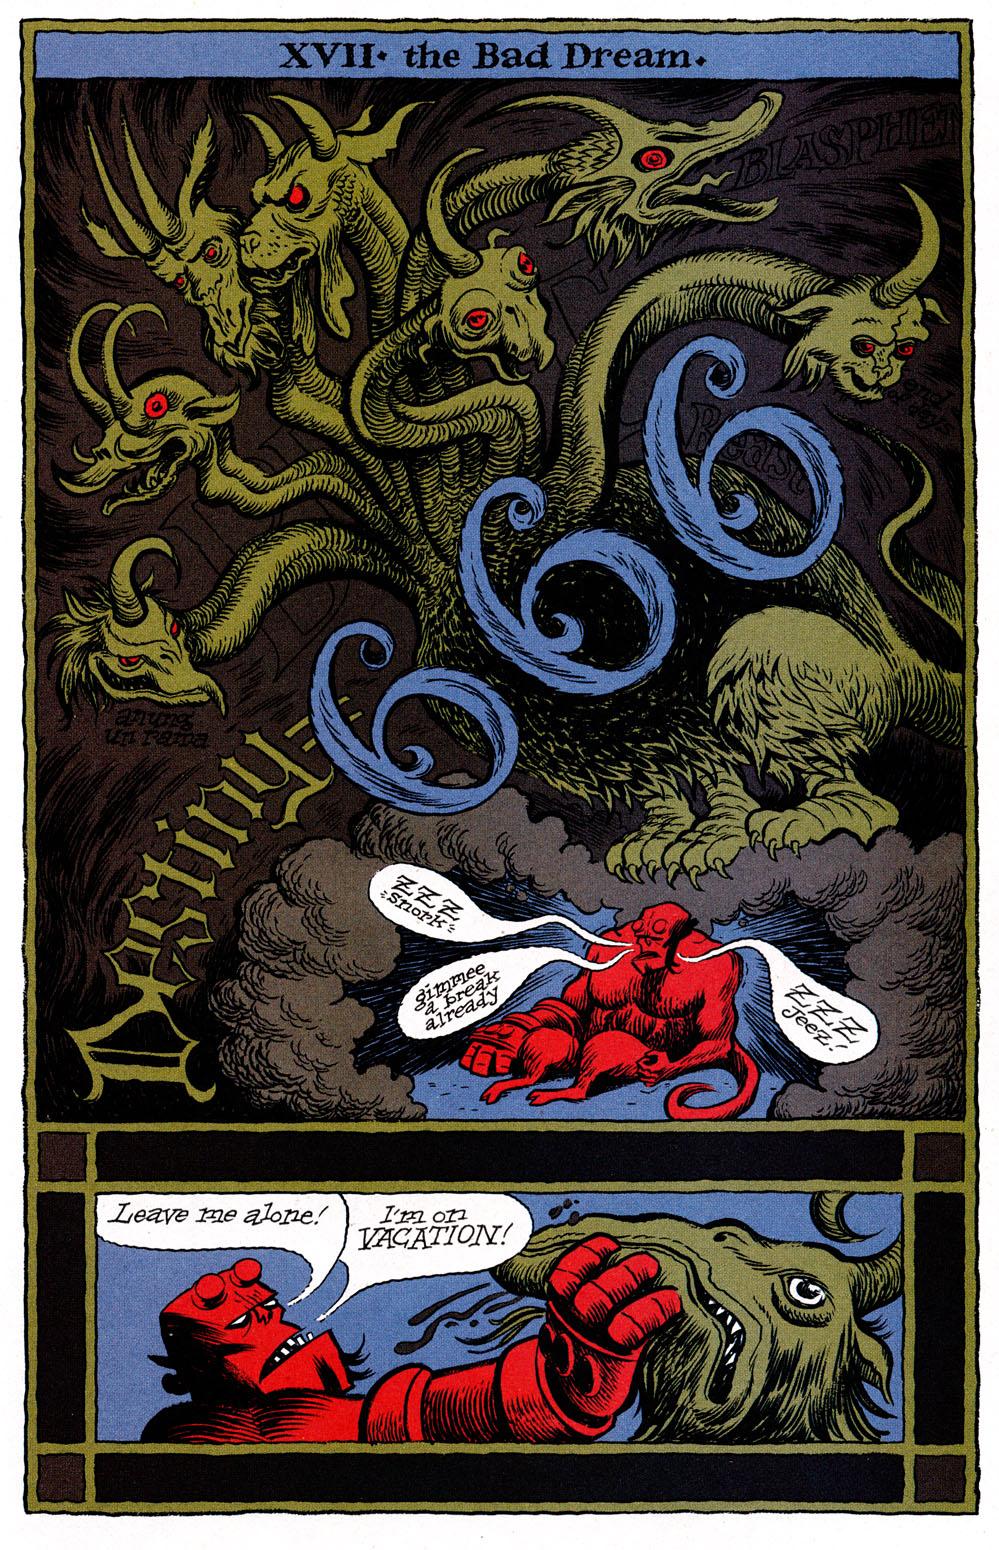 Read online Hellboy: Weird Tales comic -  Issue #6 - 23